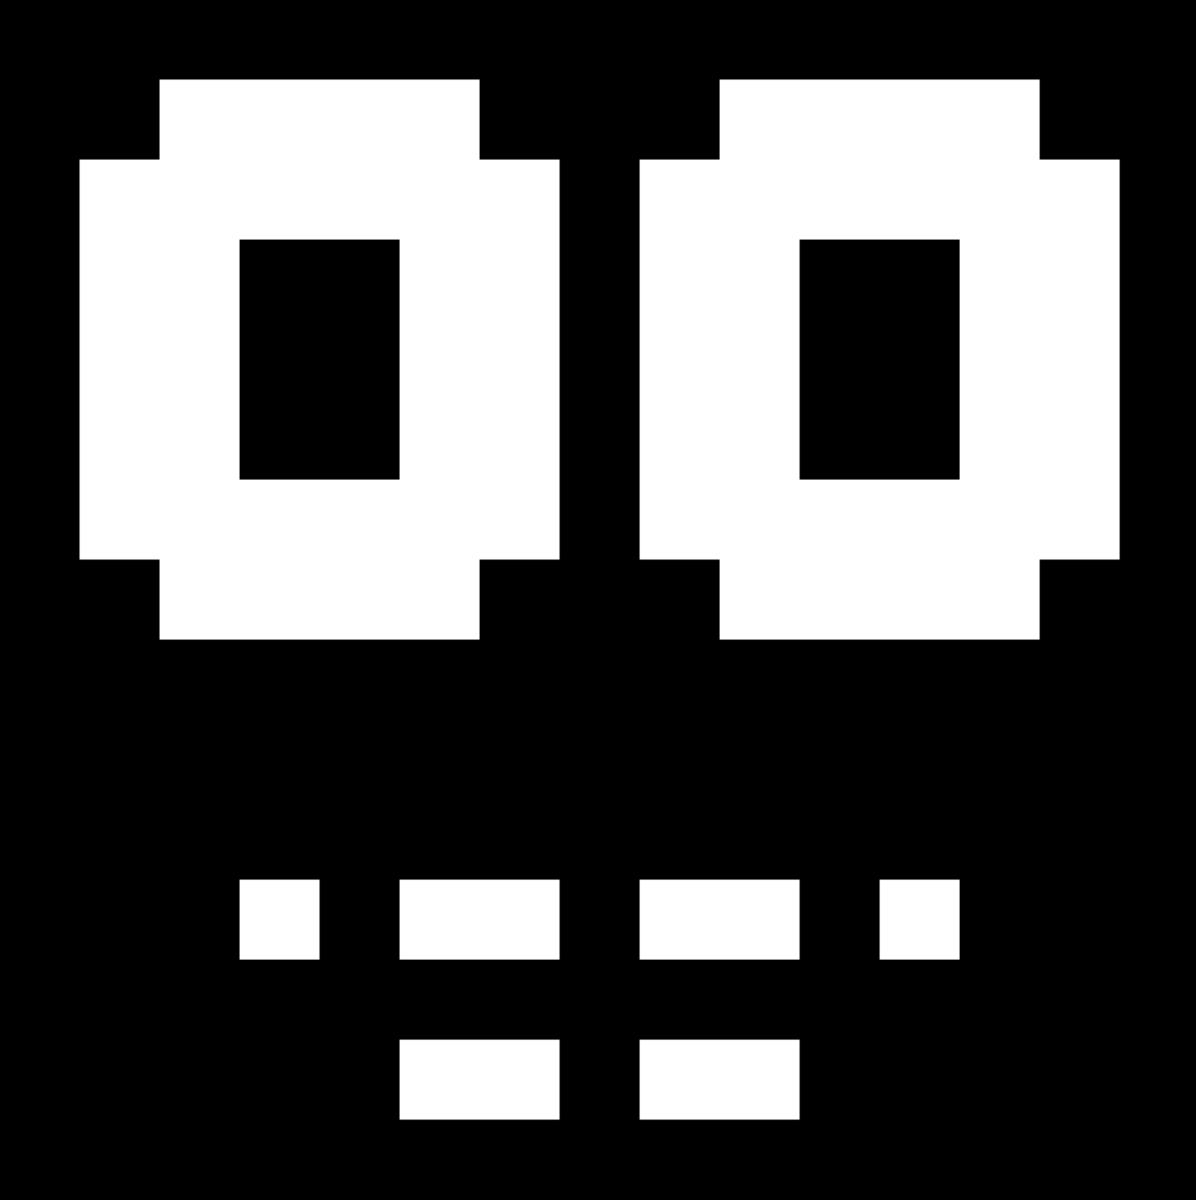 [URL=https://imageshack.com/i/gi7e46p][IMG]http://imagizer.imageshack.us/v2/1600x1200q90/594/7e46.png[/IMG][/URL] 7e46